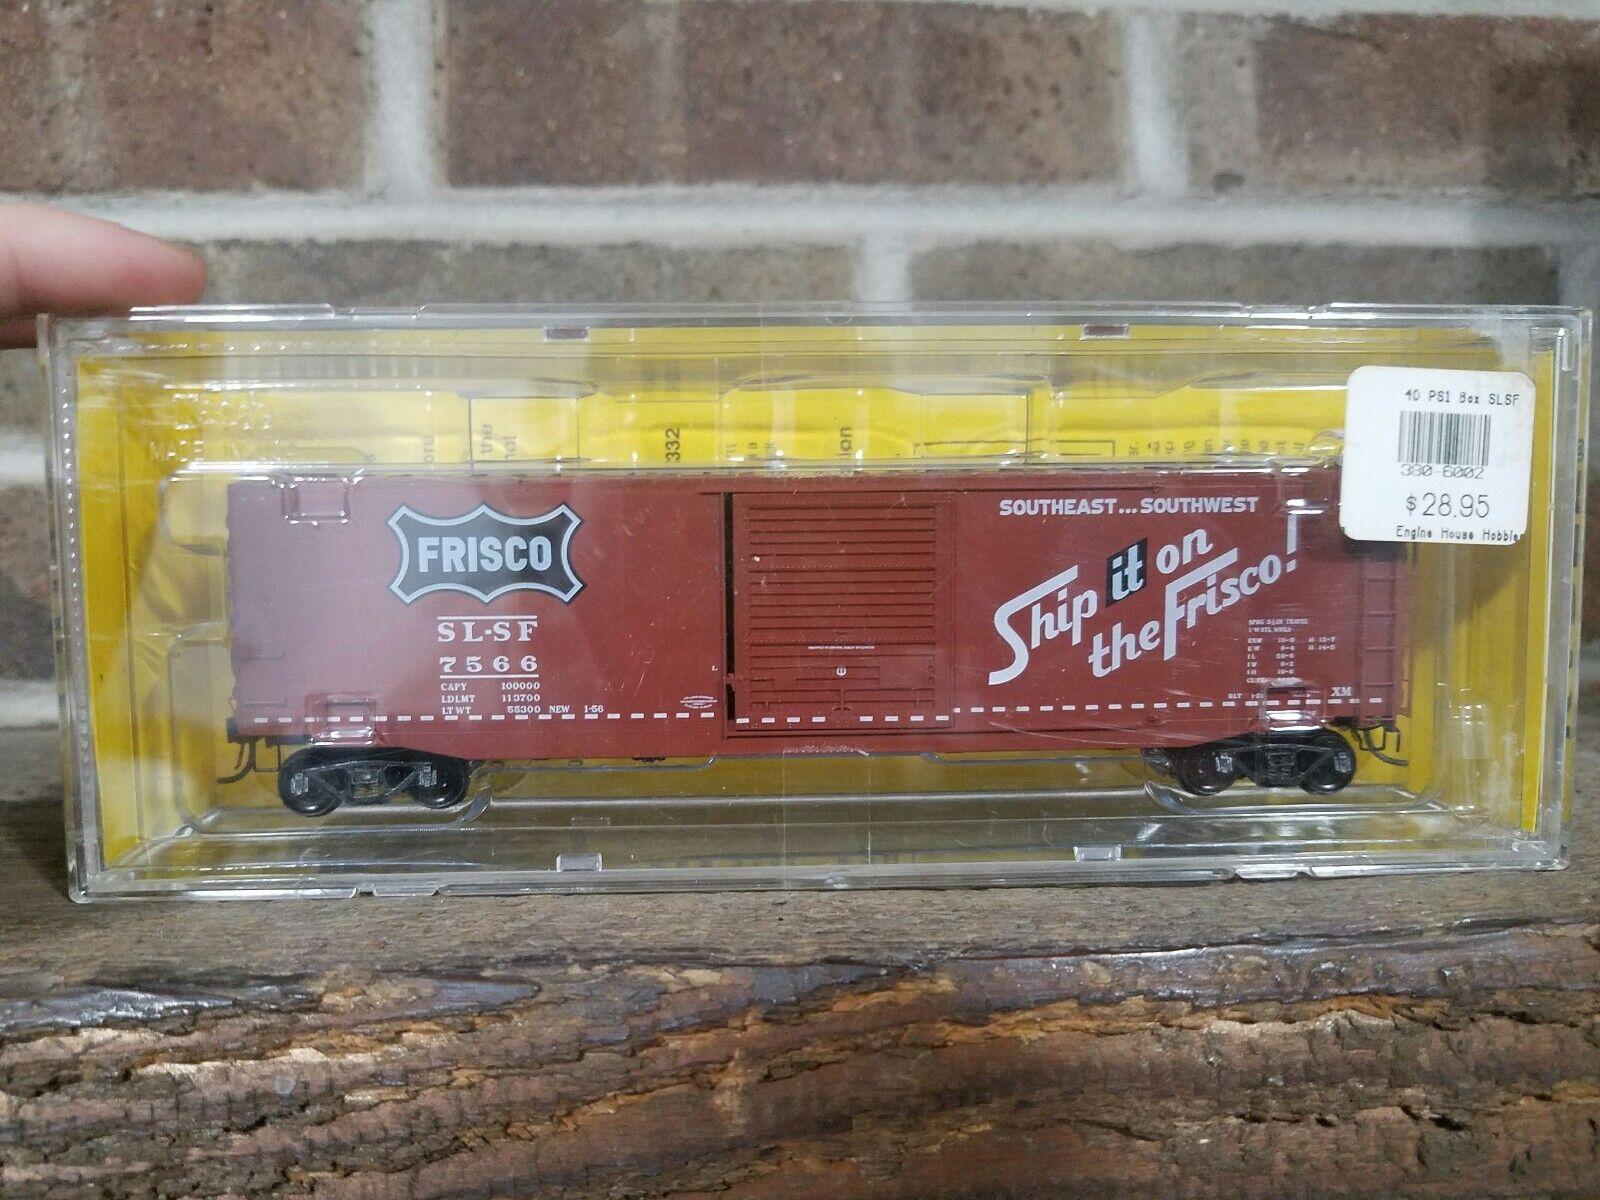 HO Scale Kadee 6002 SLSF Frisco Ship It On 50' scatola auto  7566 modellolo Train  2